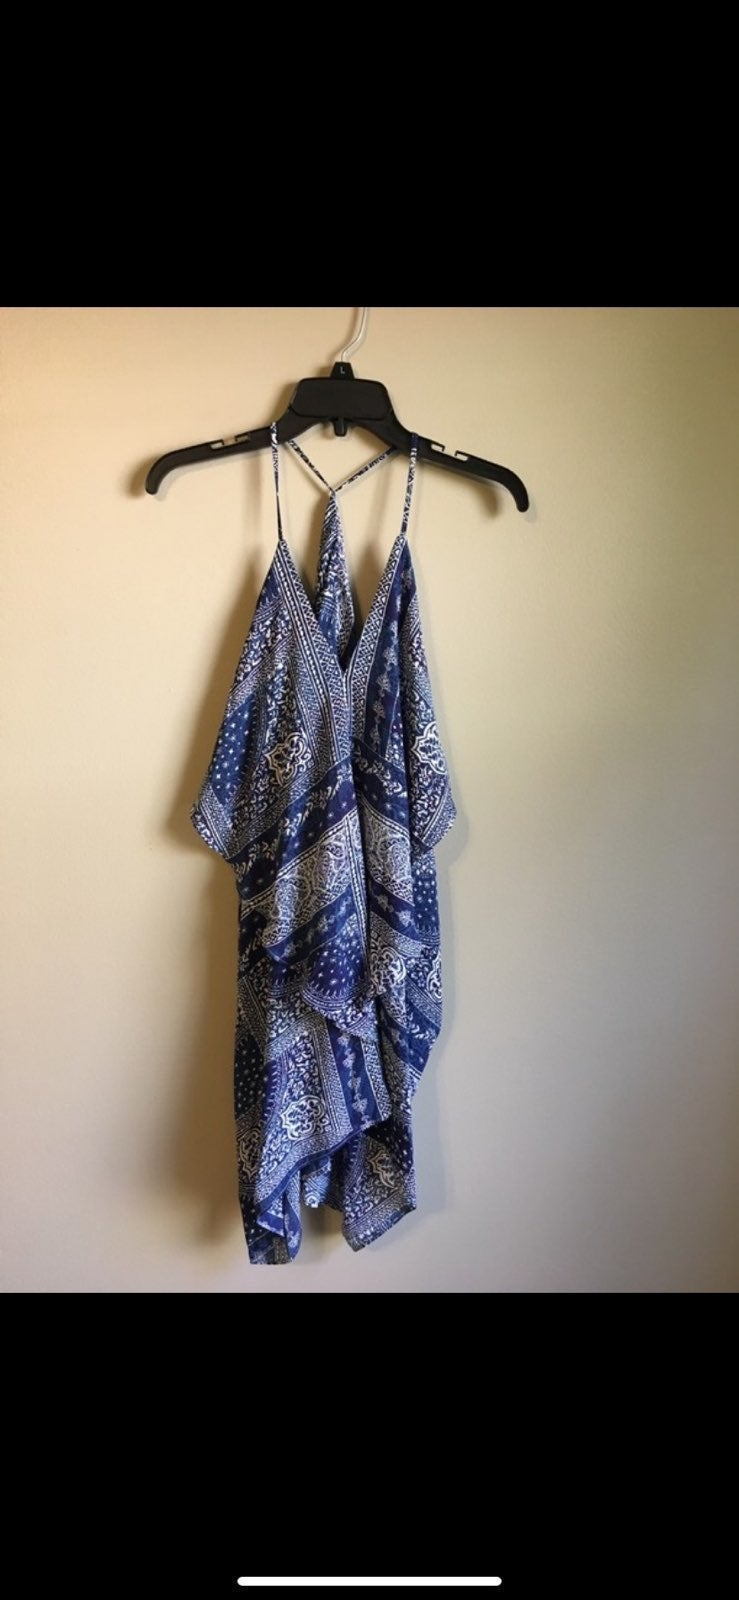 Oliveacious small blue dress